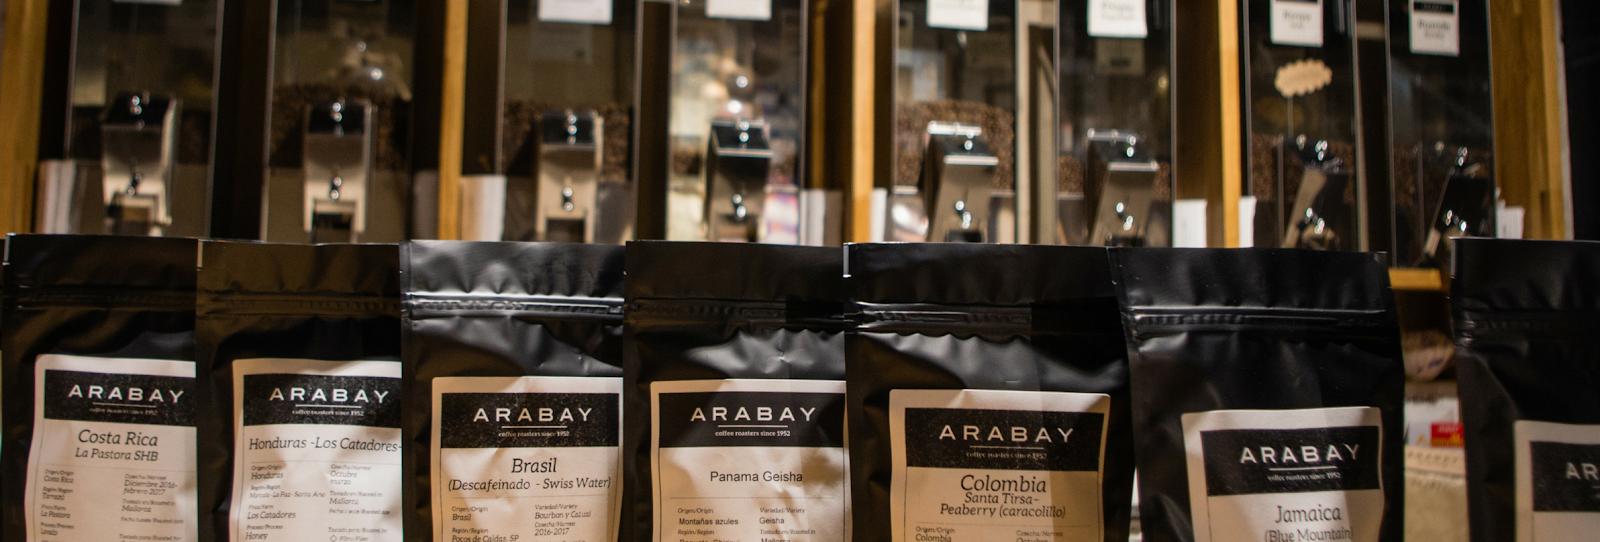 ARABAY CAFES